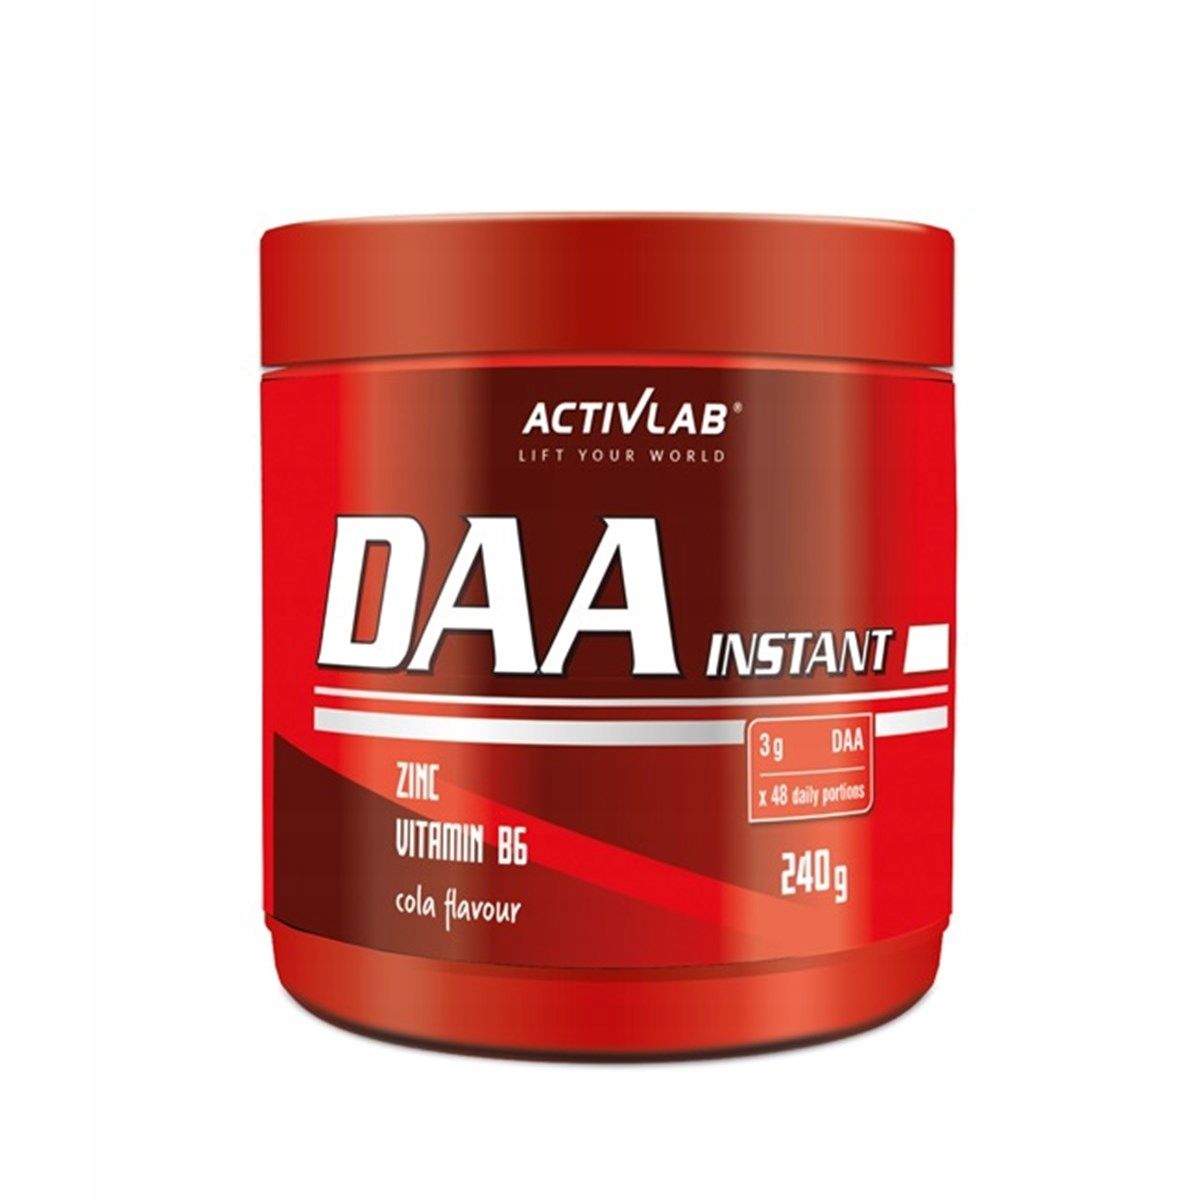 ActivLab DAA Instant 240g cola podnieś teścia !